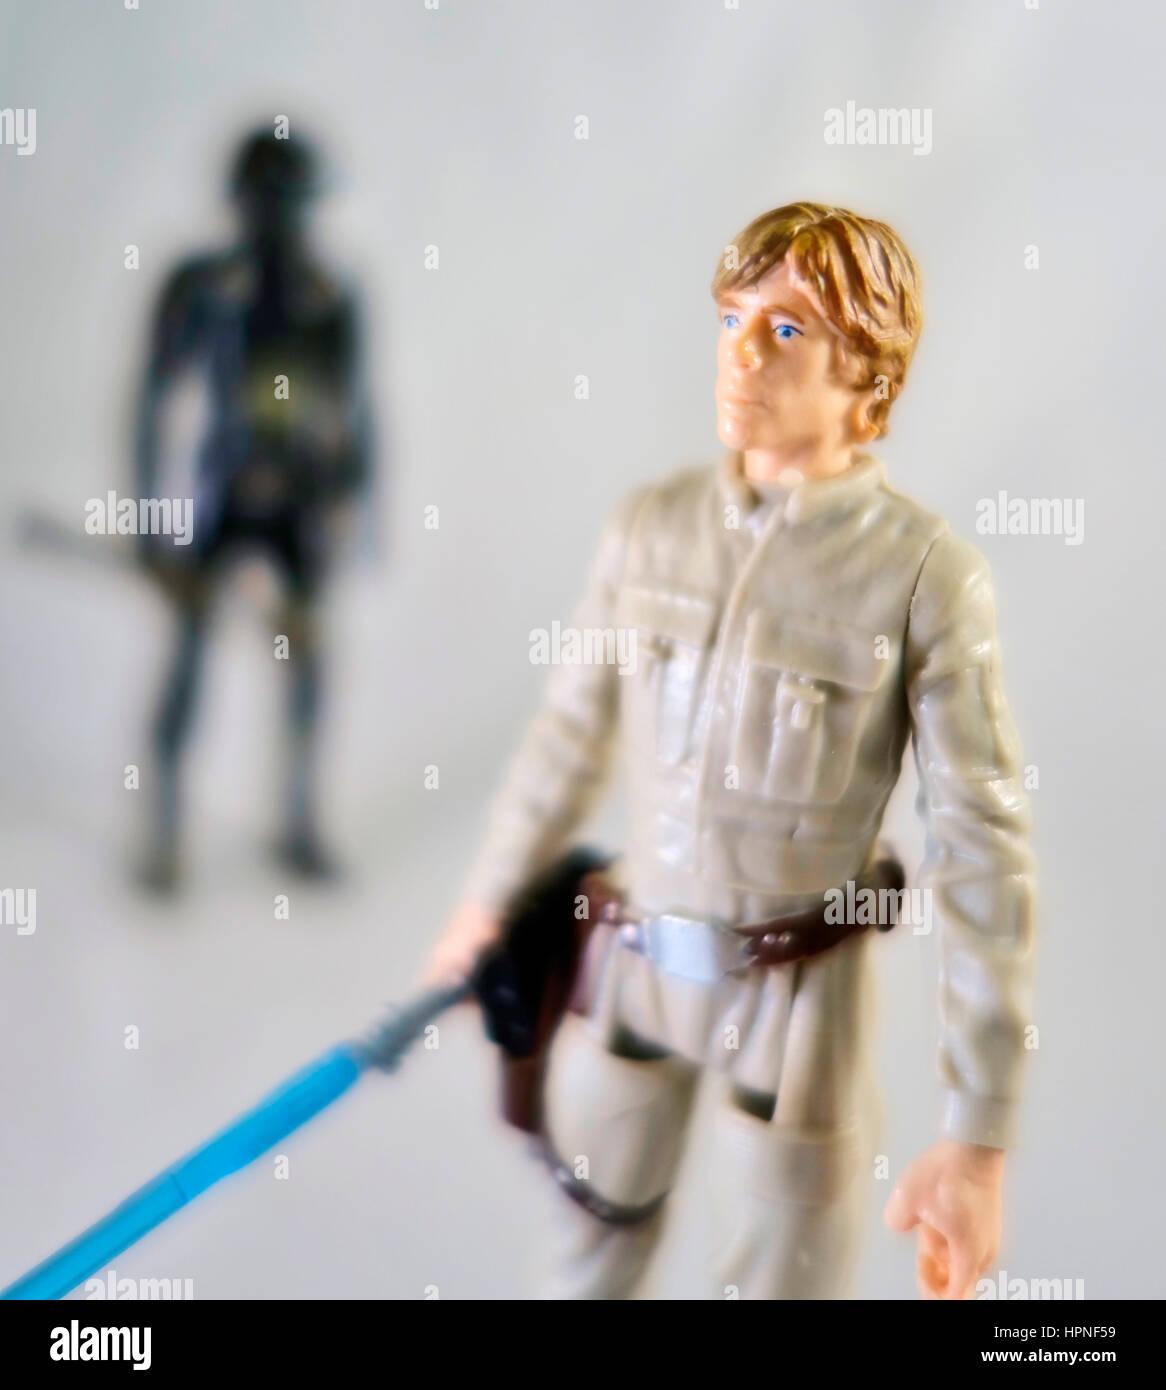 A Luke Skywalker Star Wars action figure - Stock Image